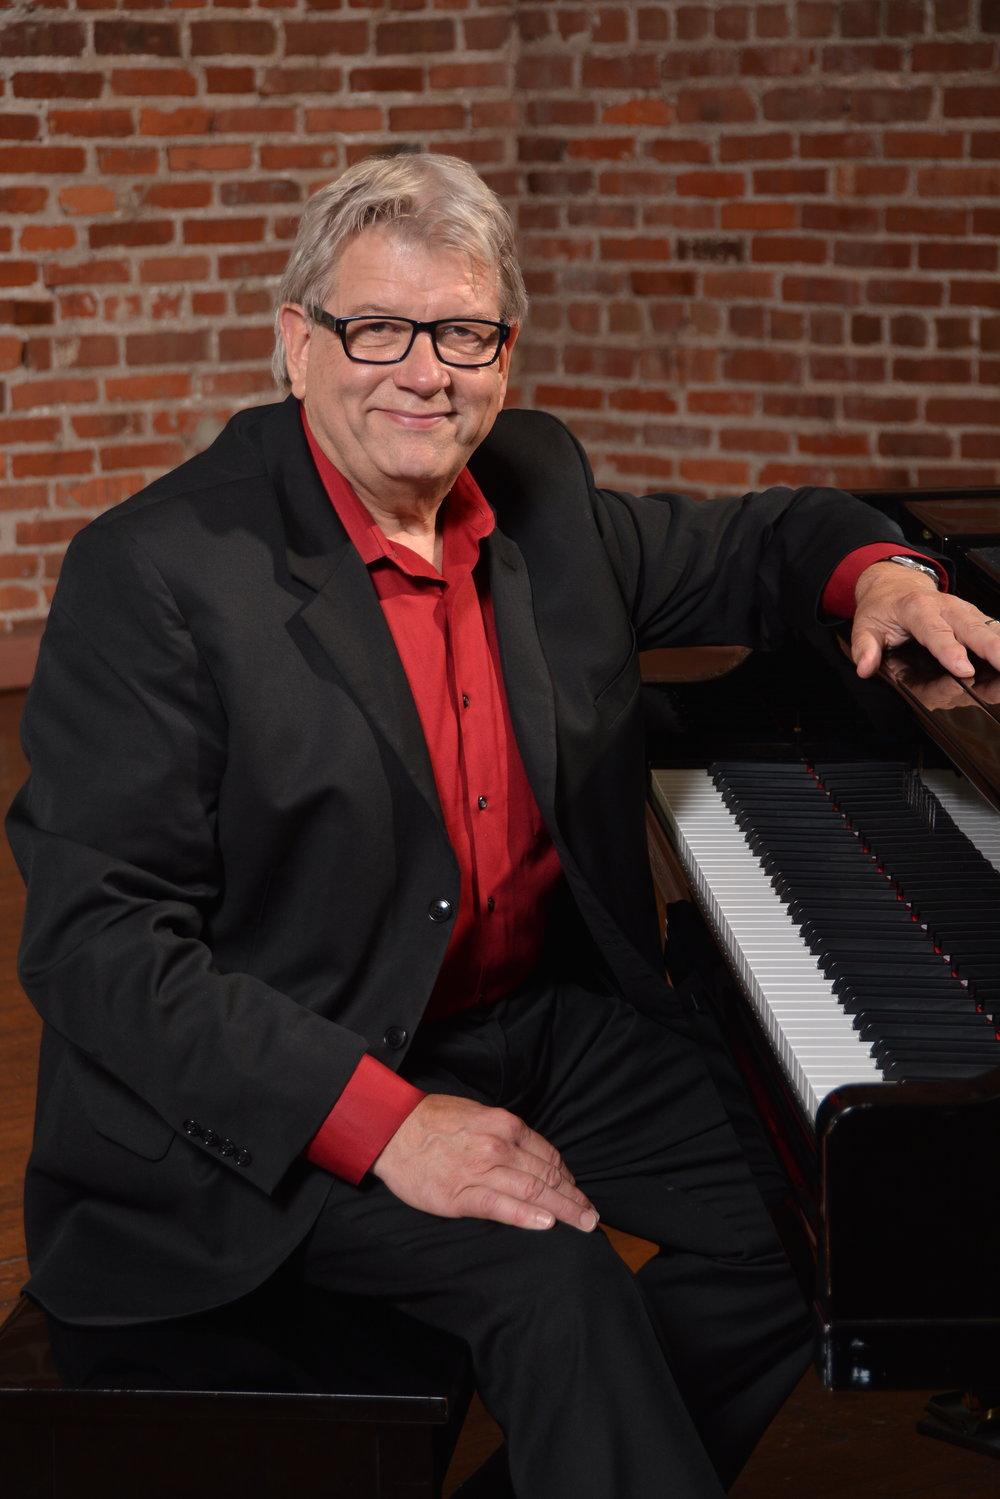 Walter Bryant - Musician, Director, Arranger, Composer, Producer, Multi-Instrumentalist